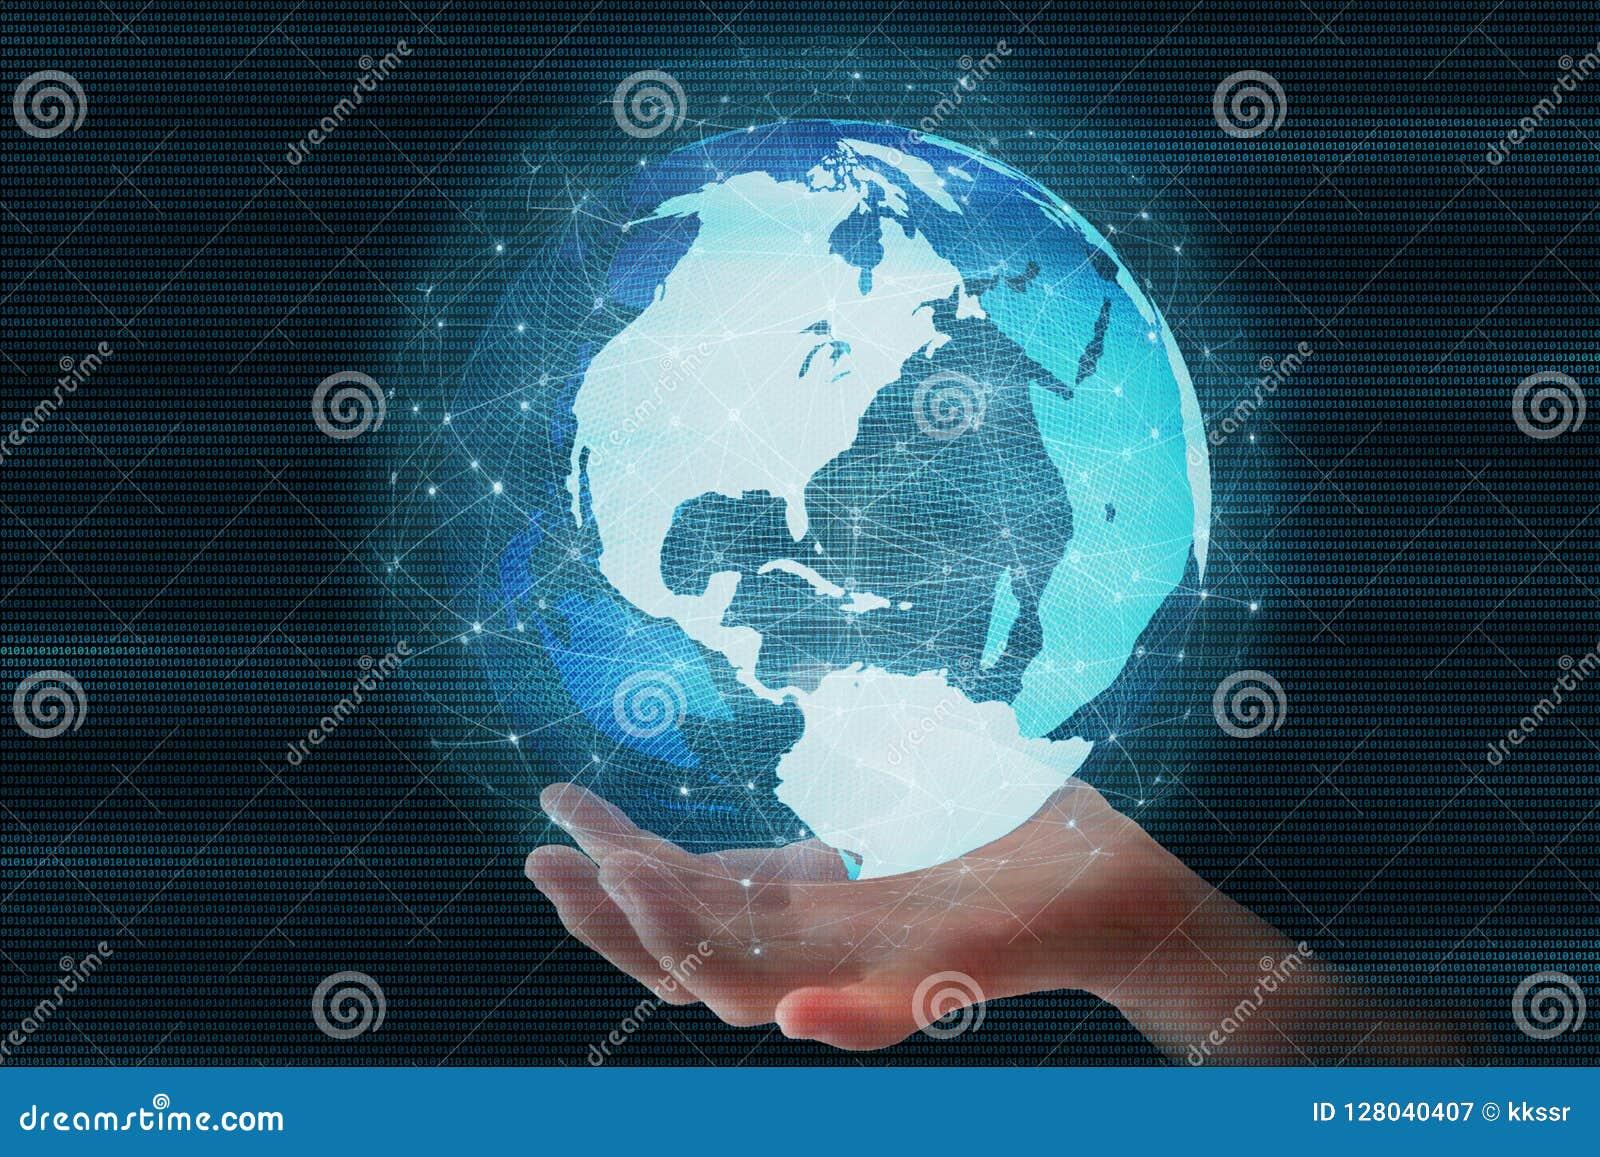 catching fast moving world futuristic globe sphere led surrounded